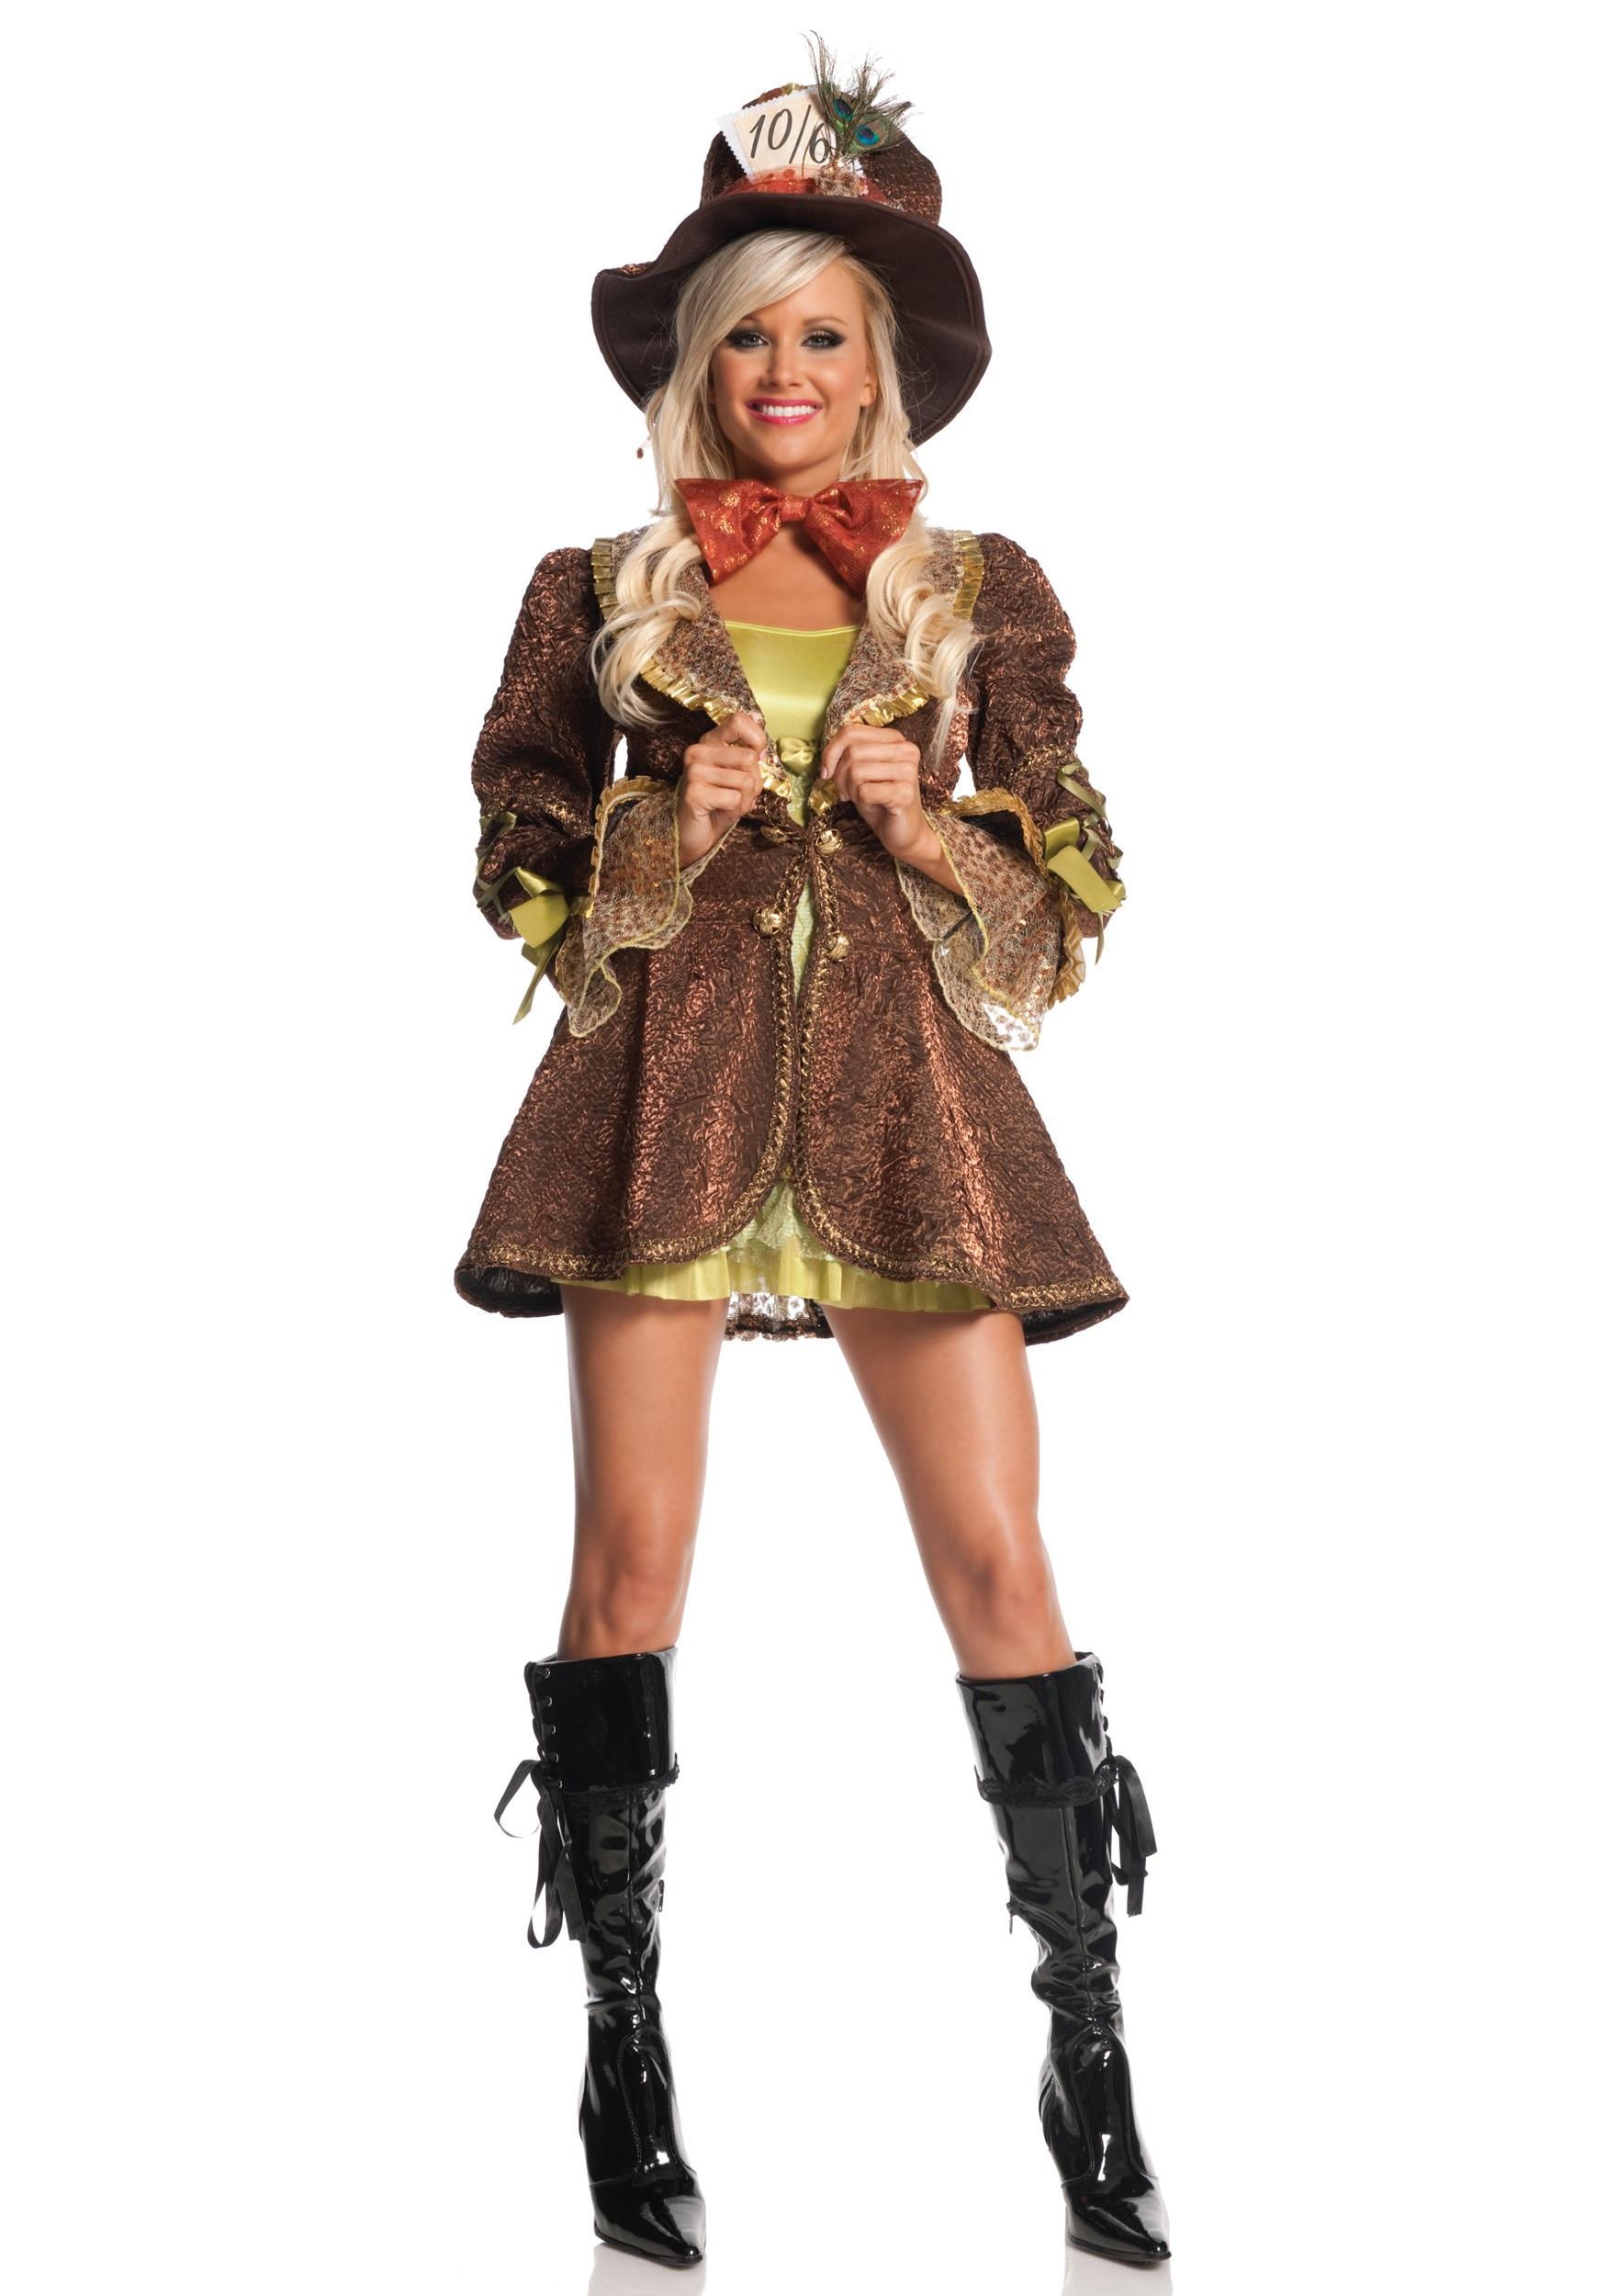 Crazy mad hatter costume